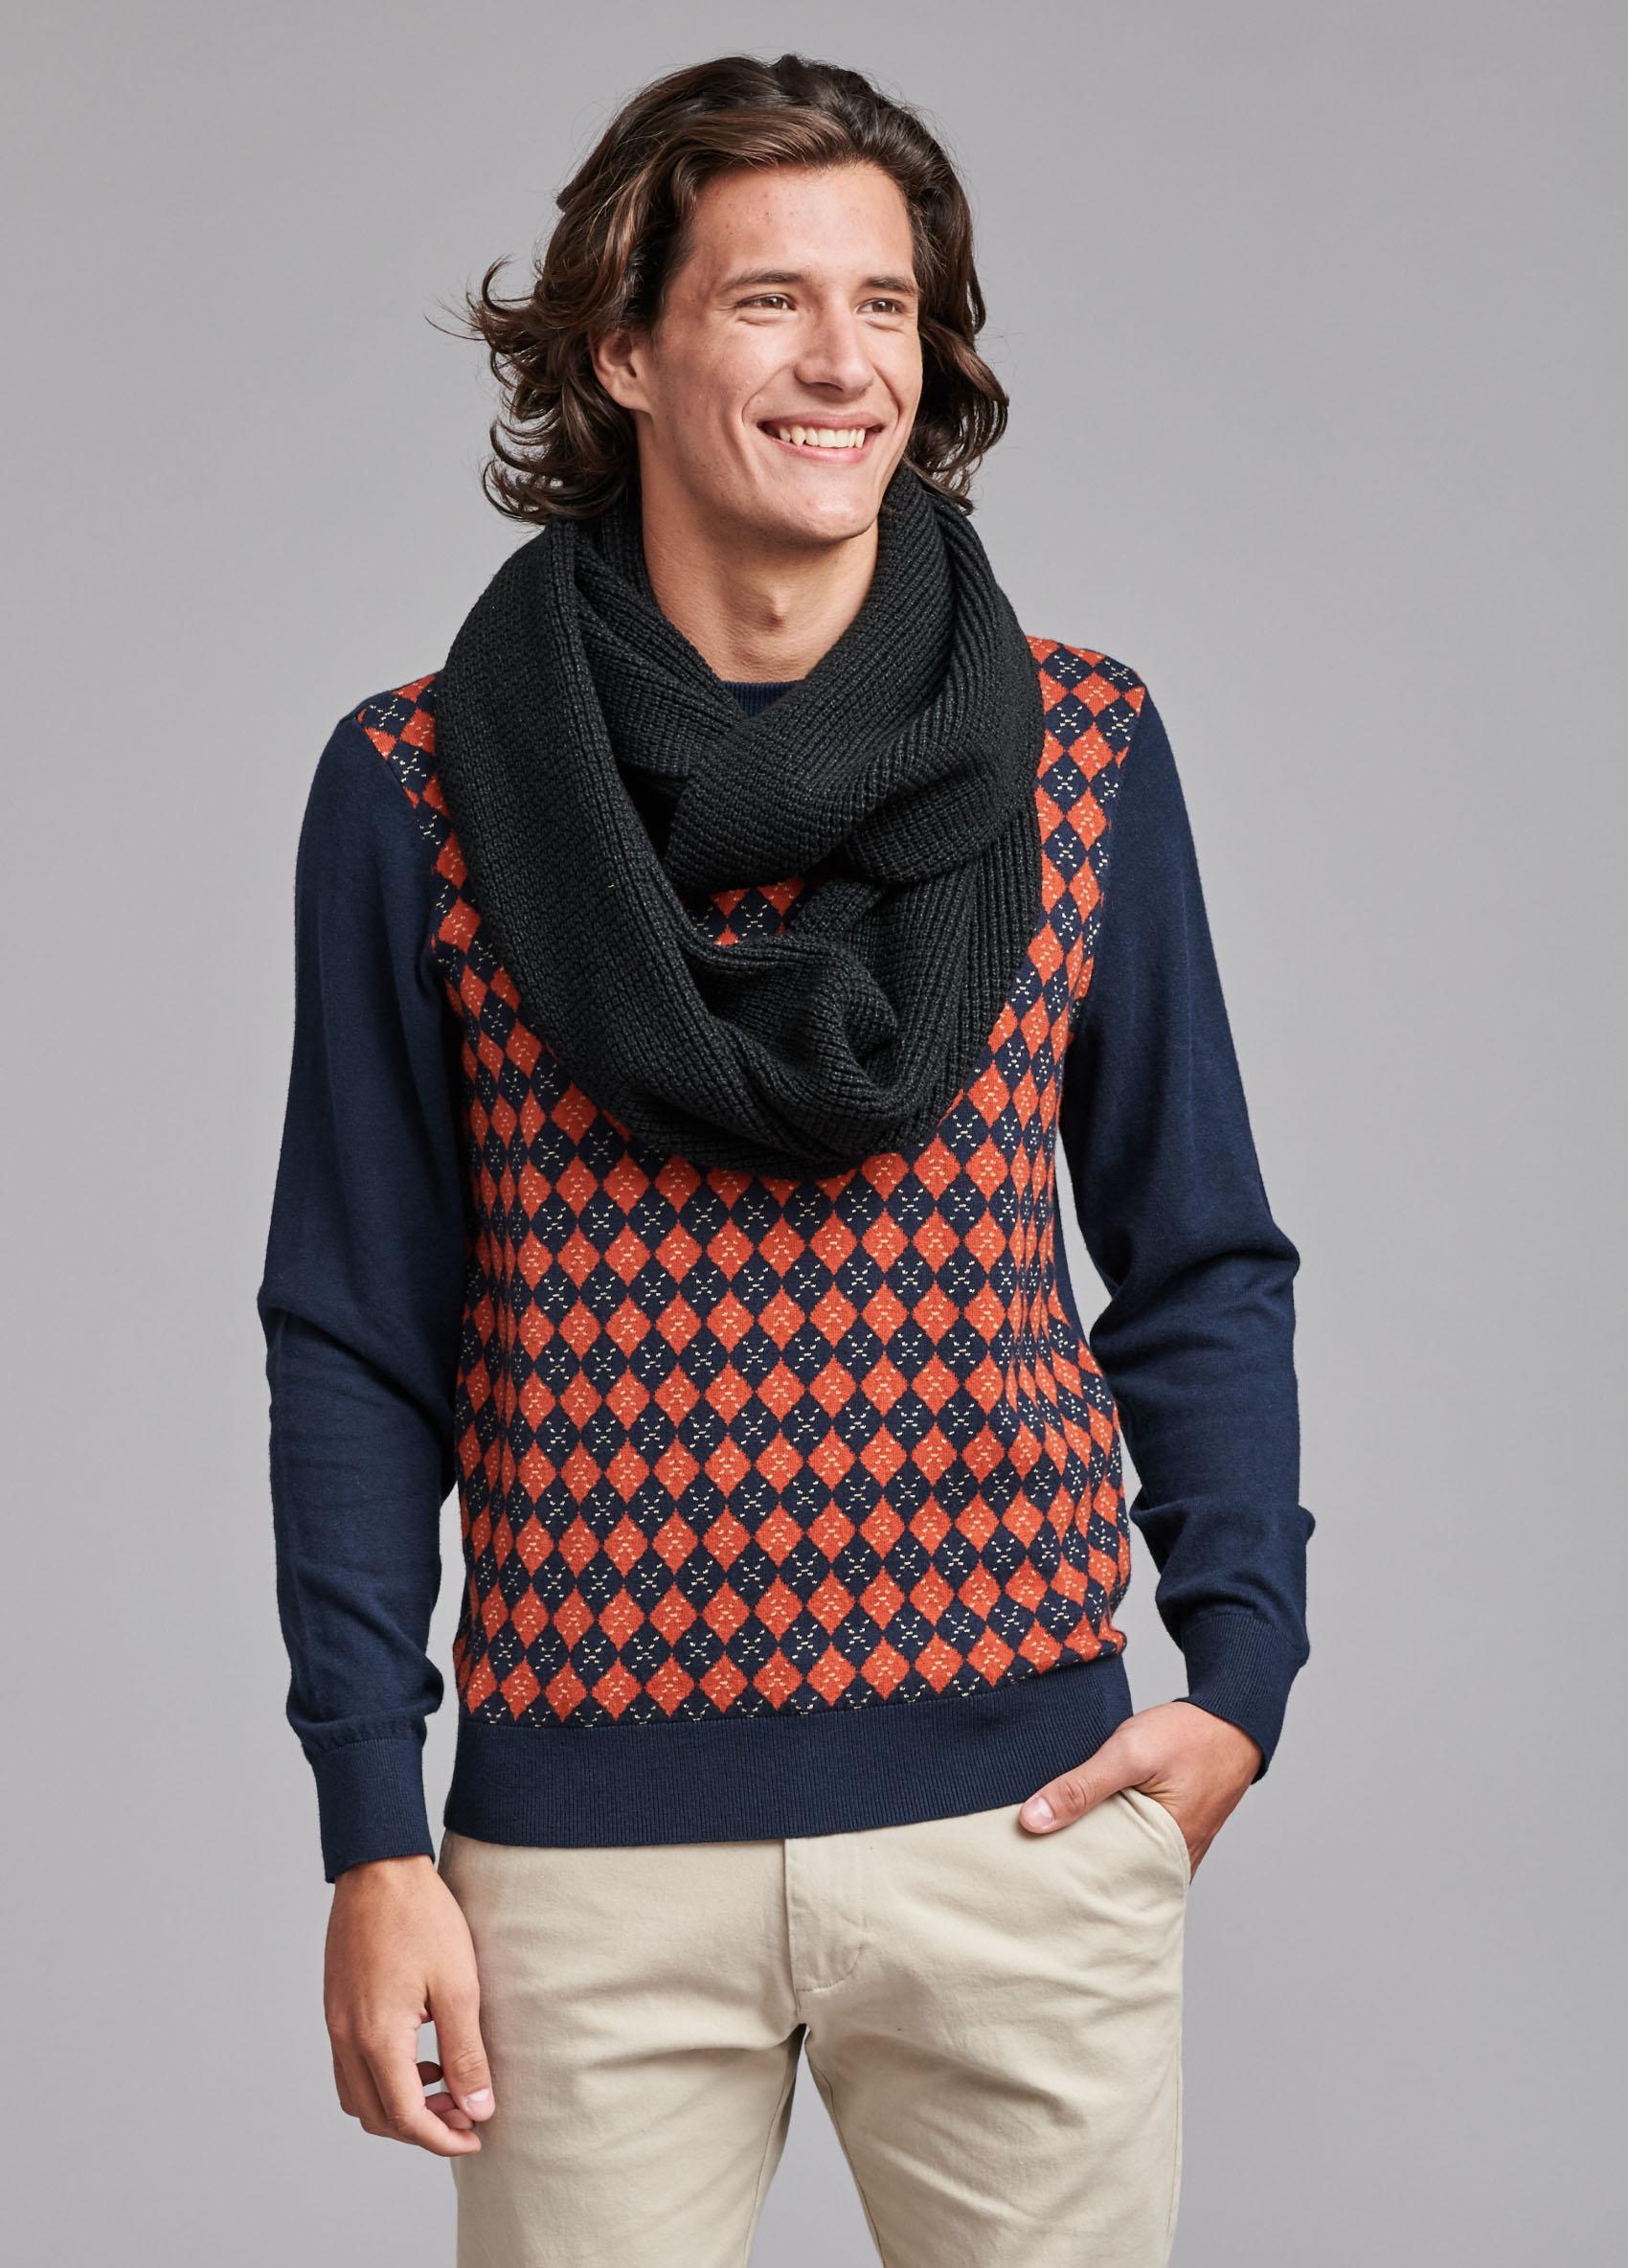 penguin_argyle-jacquard-front-sweater_15-06-2019__picture-9191